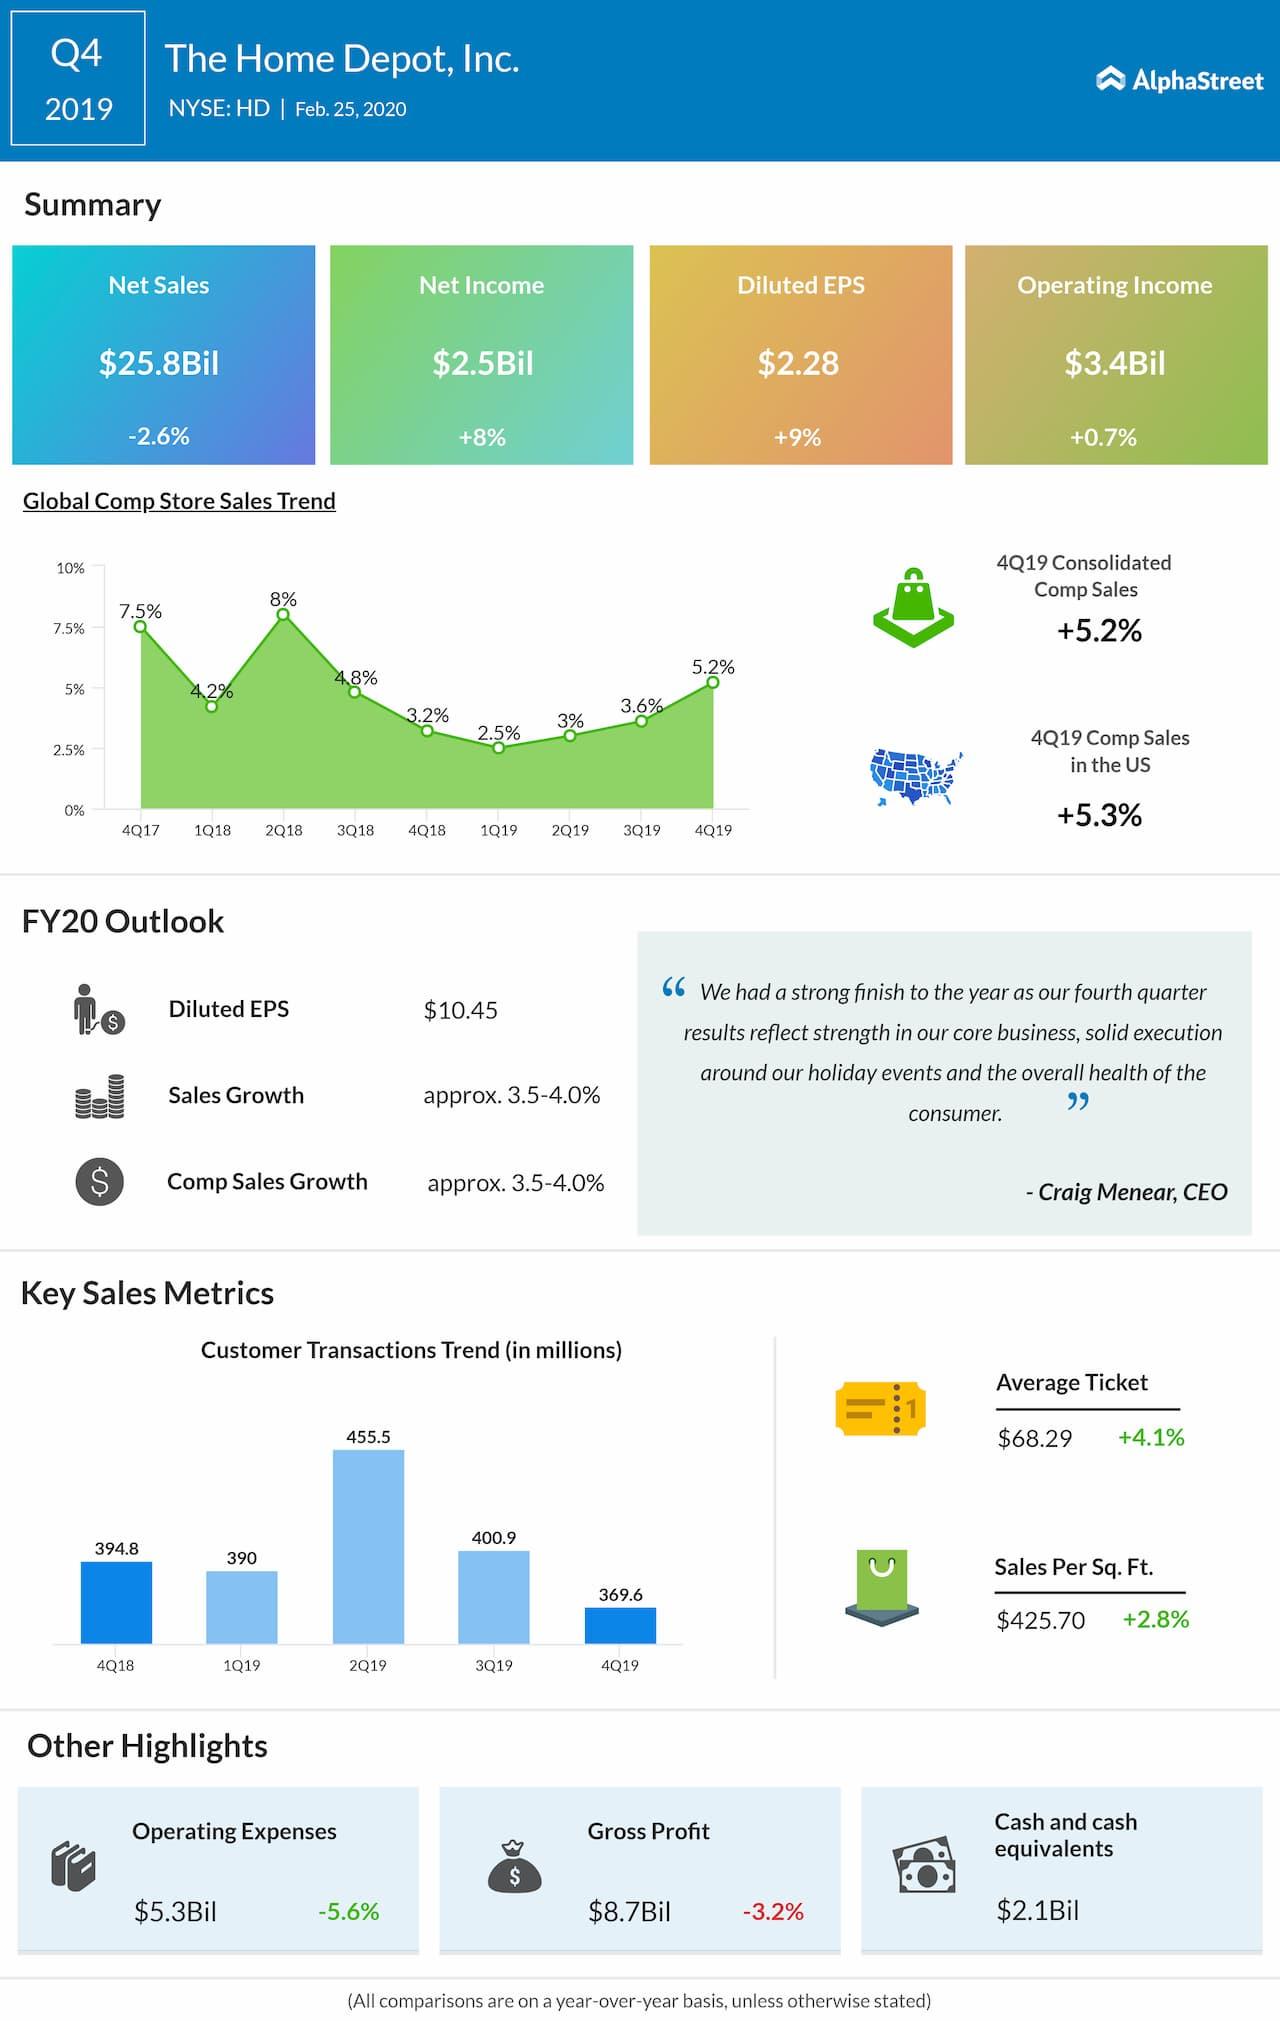 Home Depot beats Q4 2019 revenue and earnings estimates